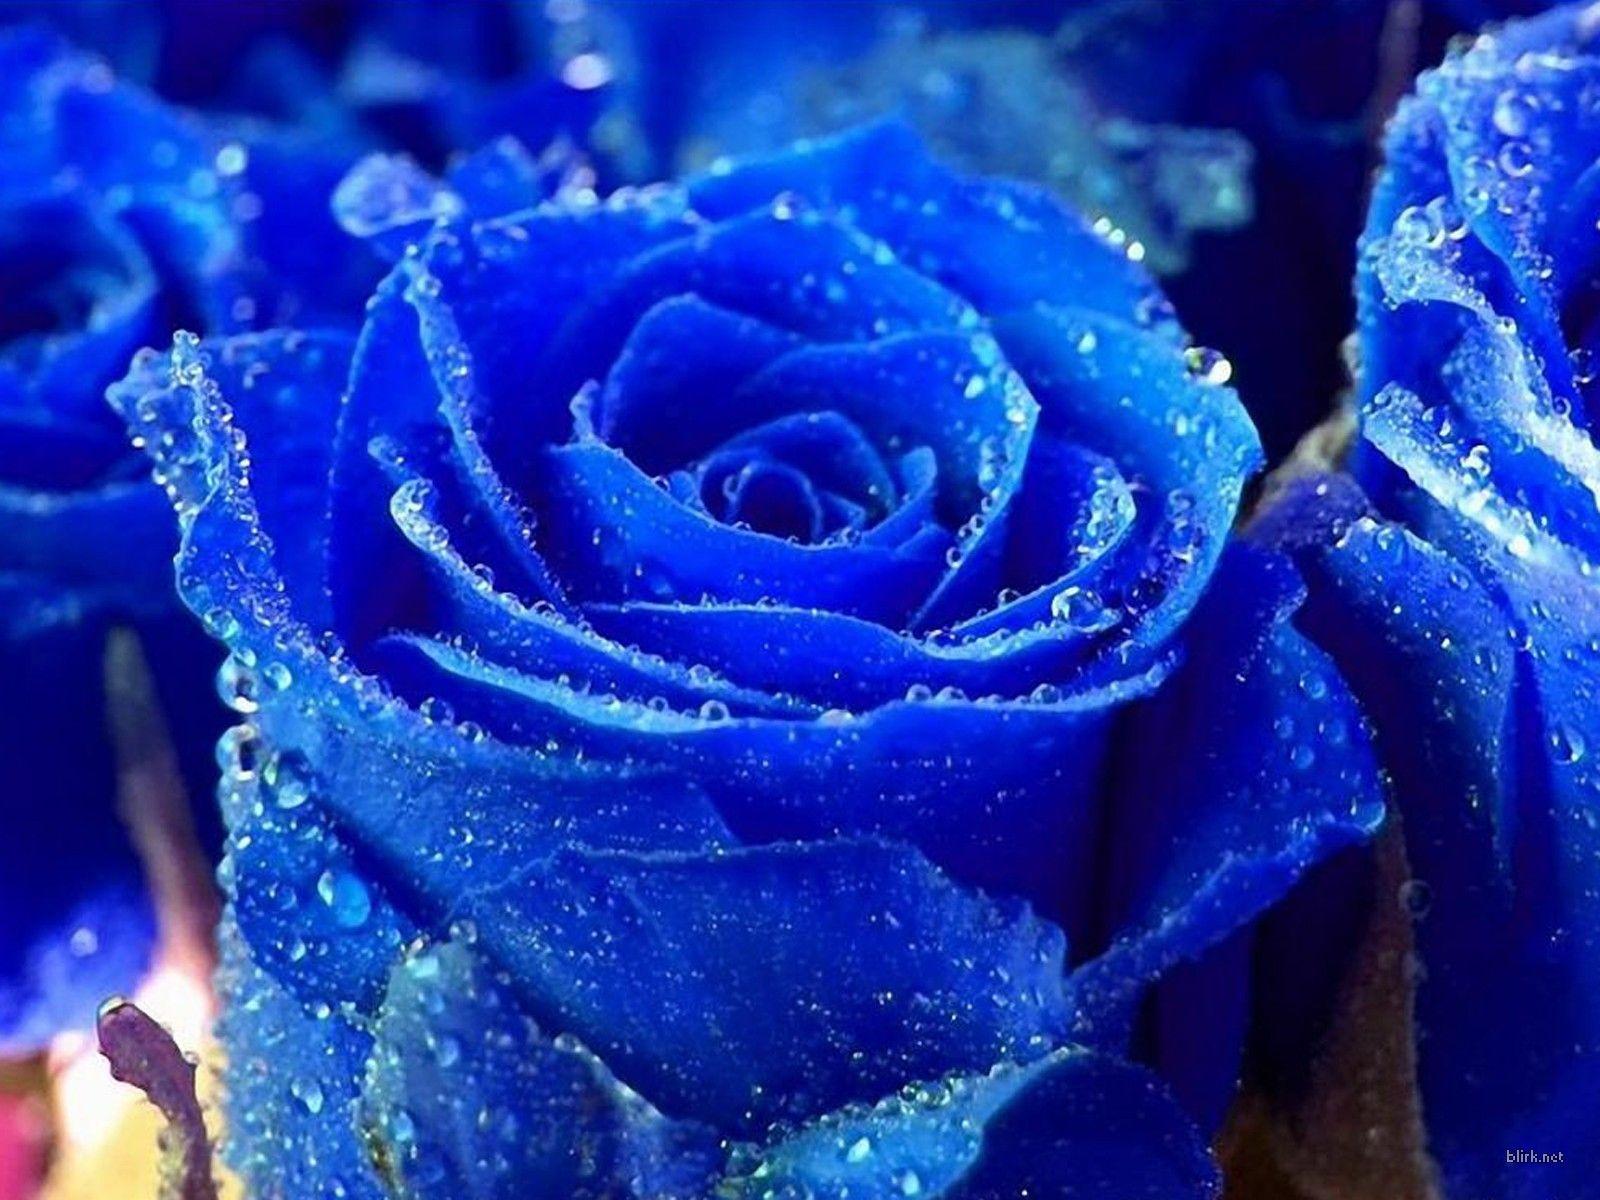 Rose wallpaper blue